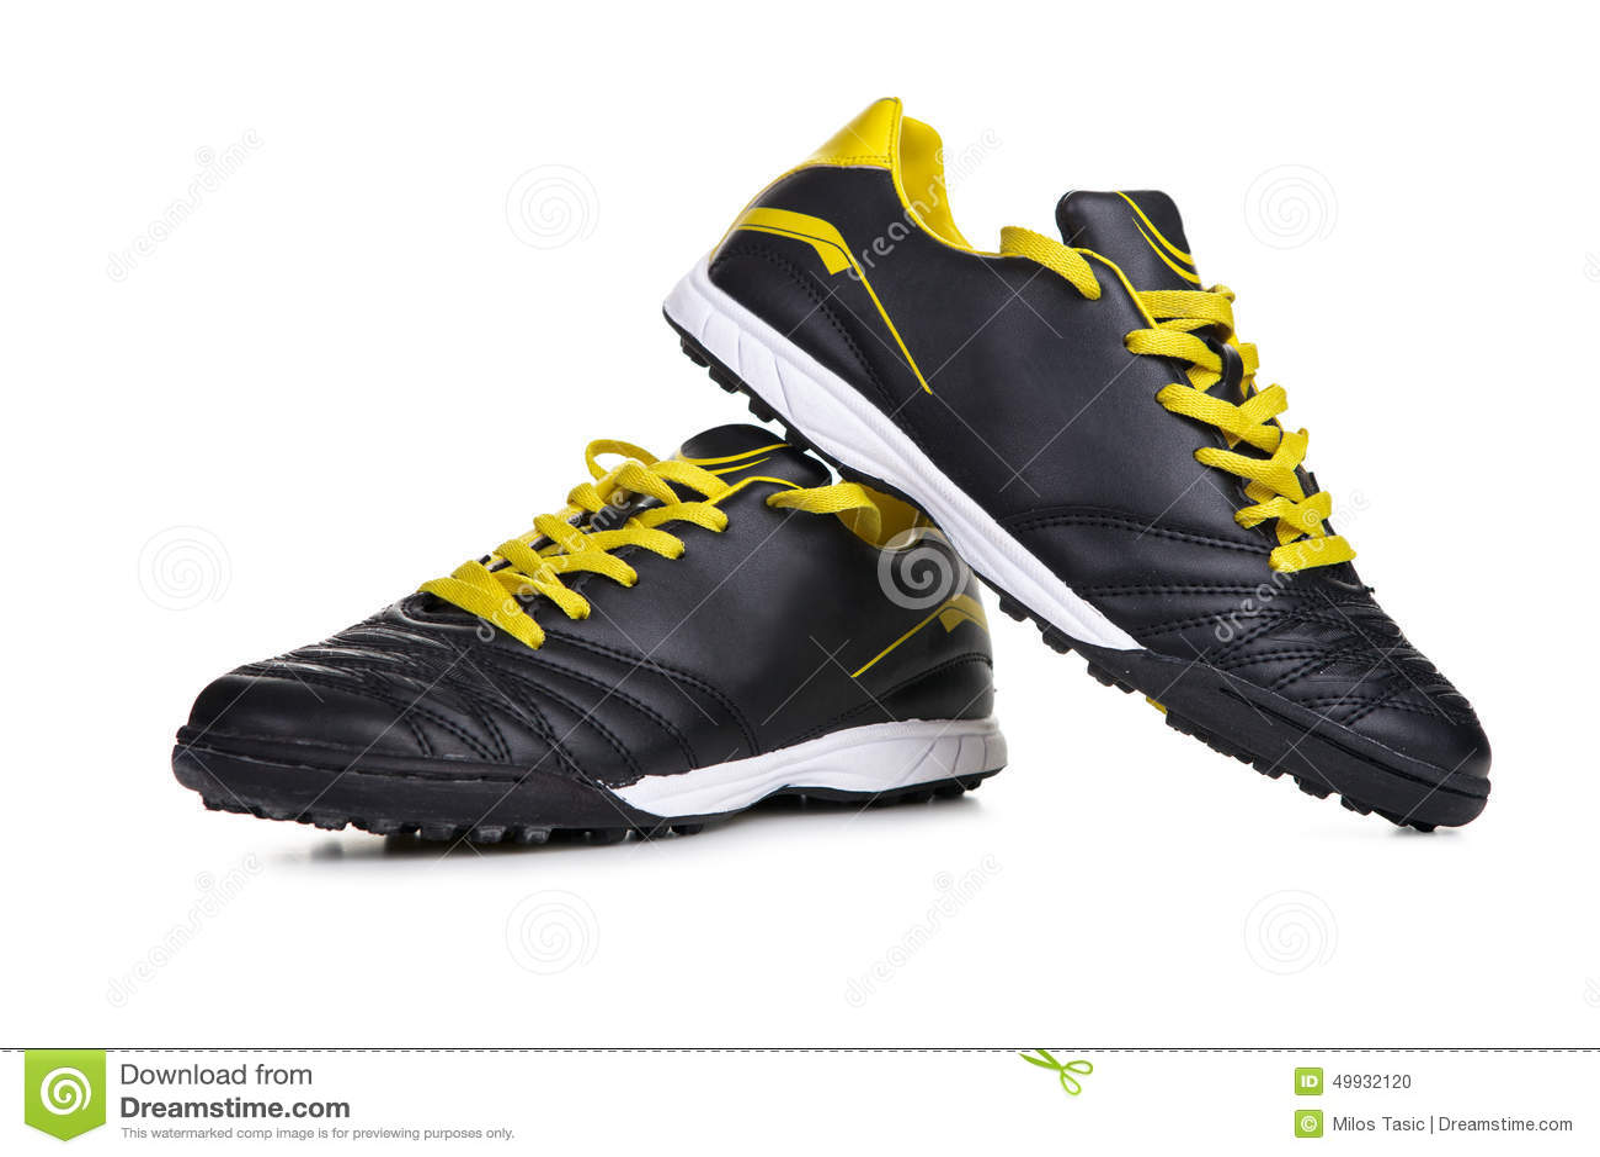 bbb63e388f9 Κίτρινα αθλητικά παπούτσια στοκ εικόνες. εικόνα από εξοπλισμός ...